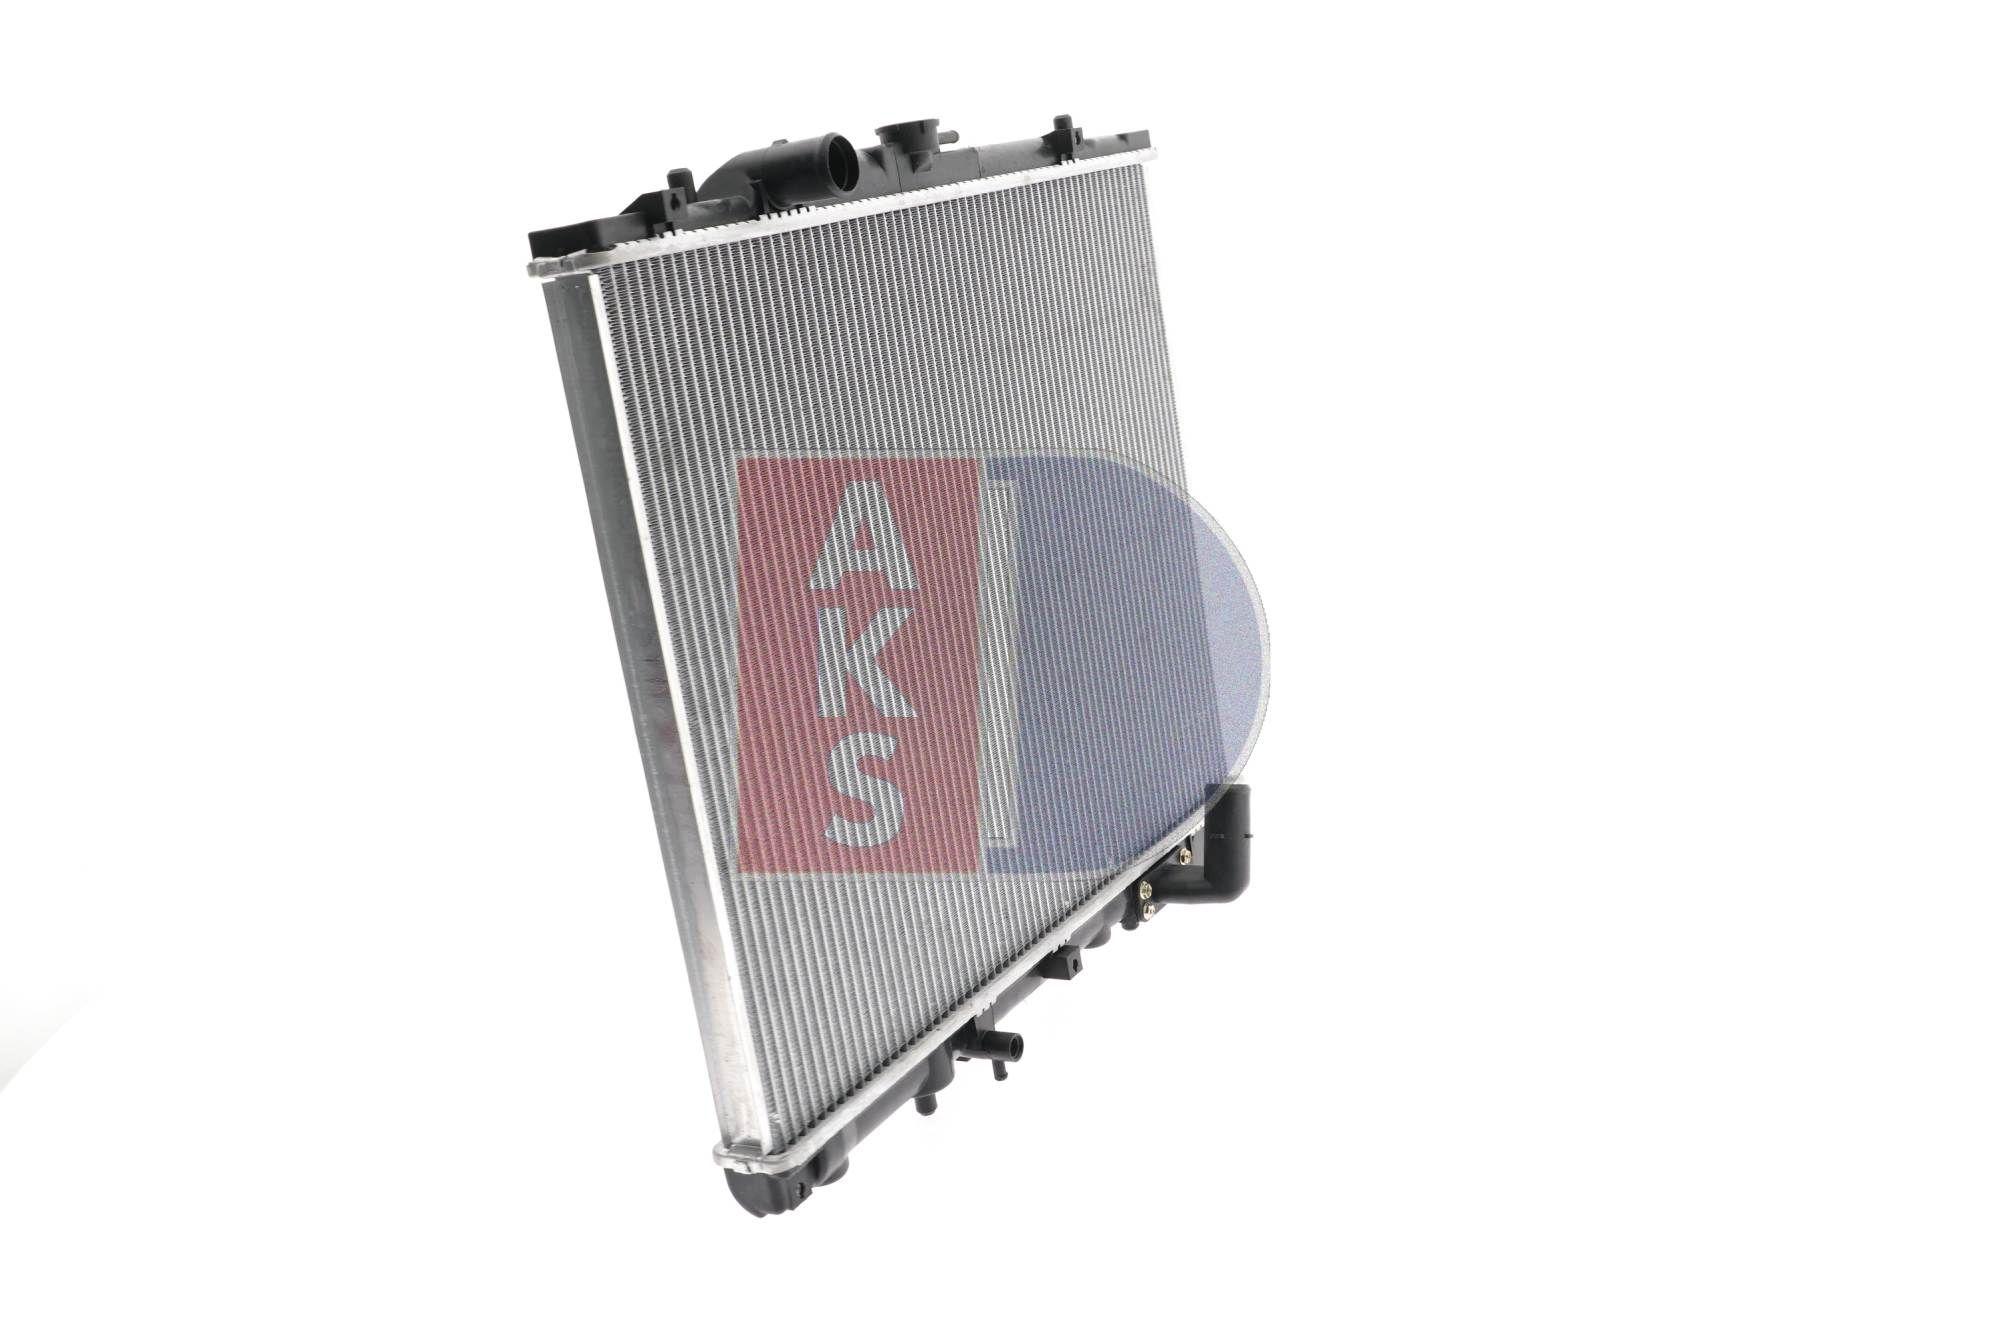 Kühler, Motorkühlung 140017N von AKS DASIS